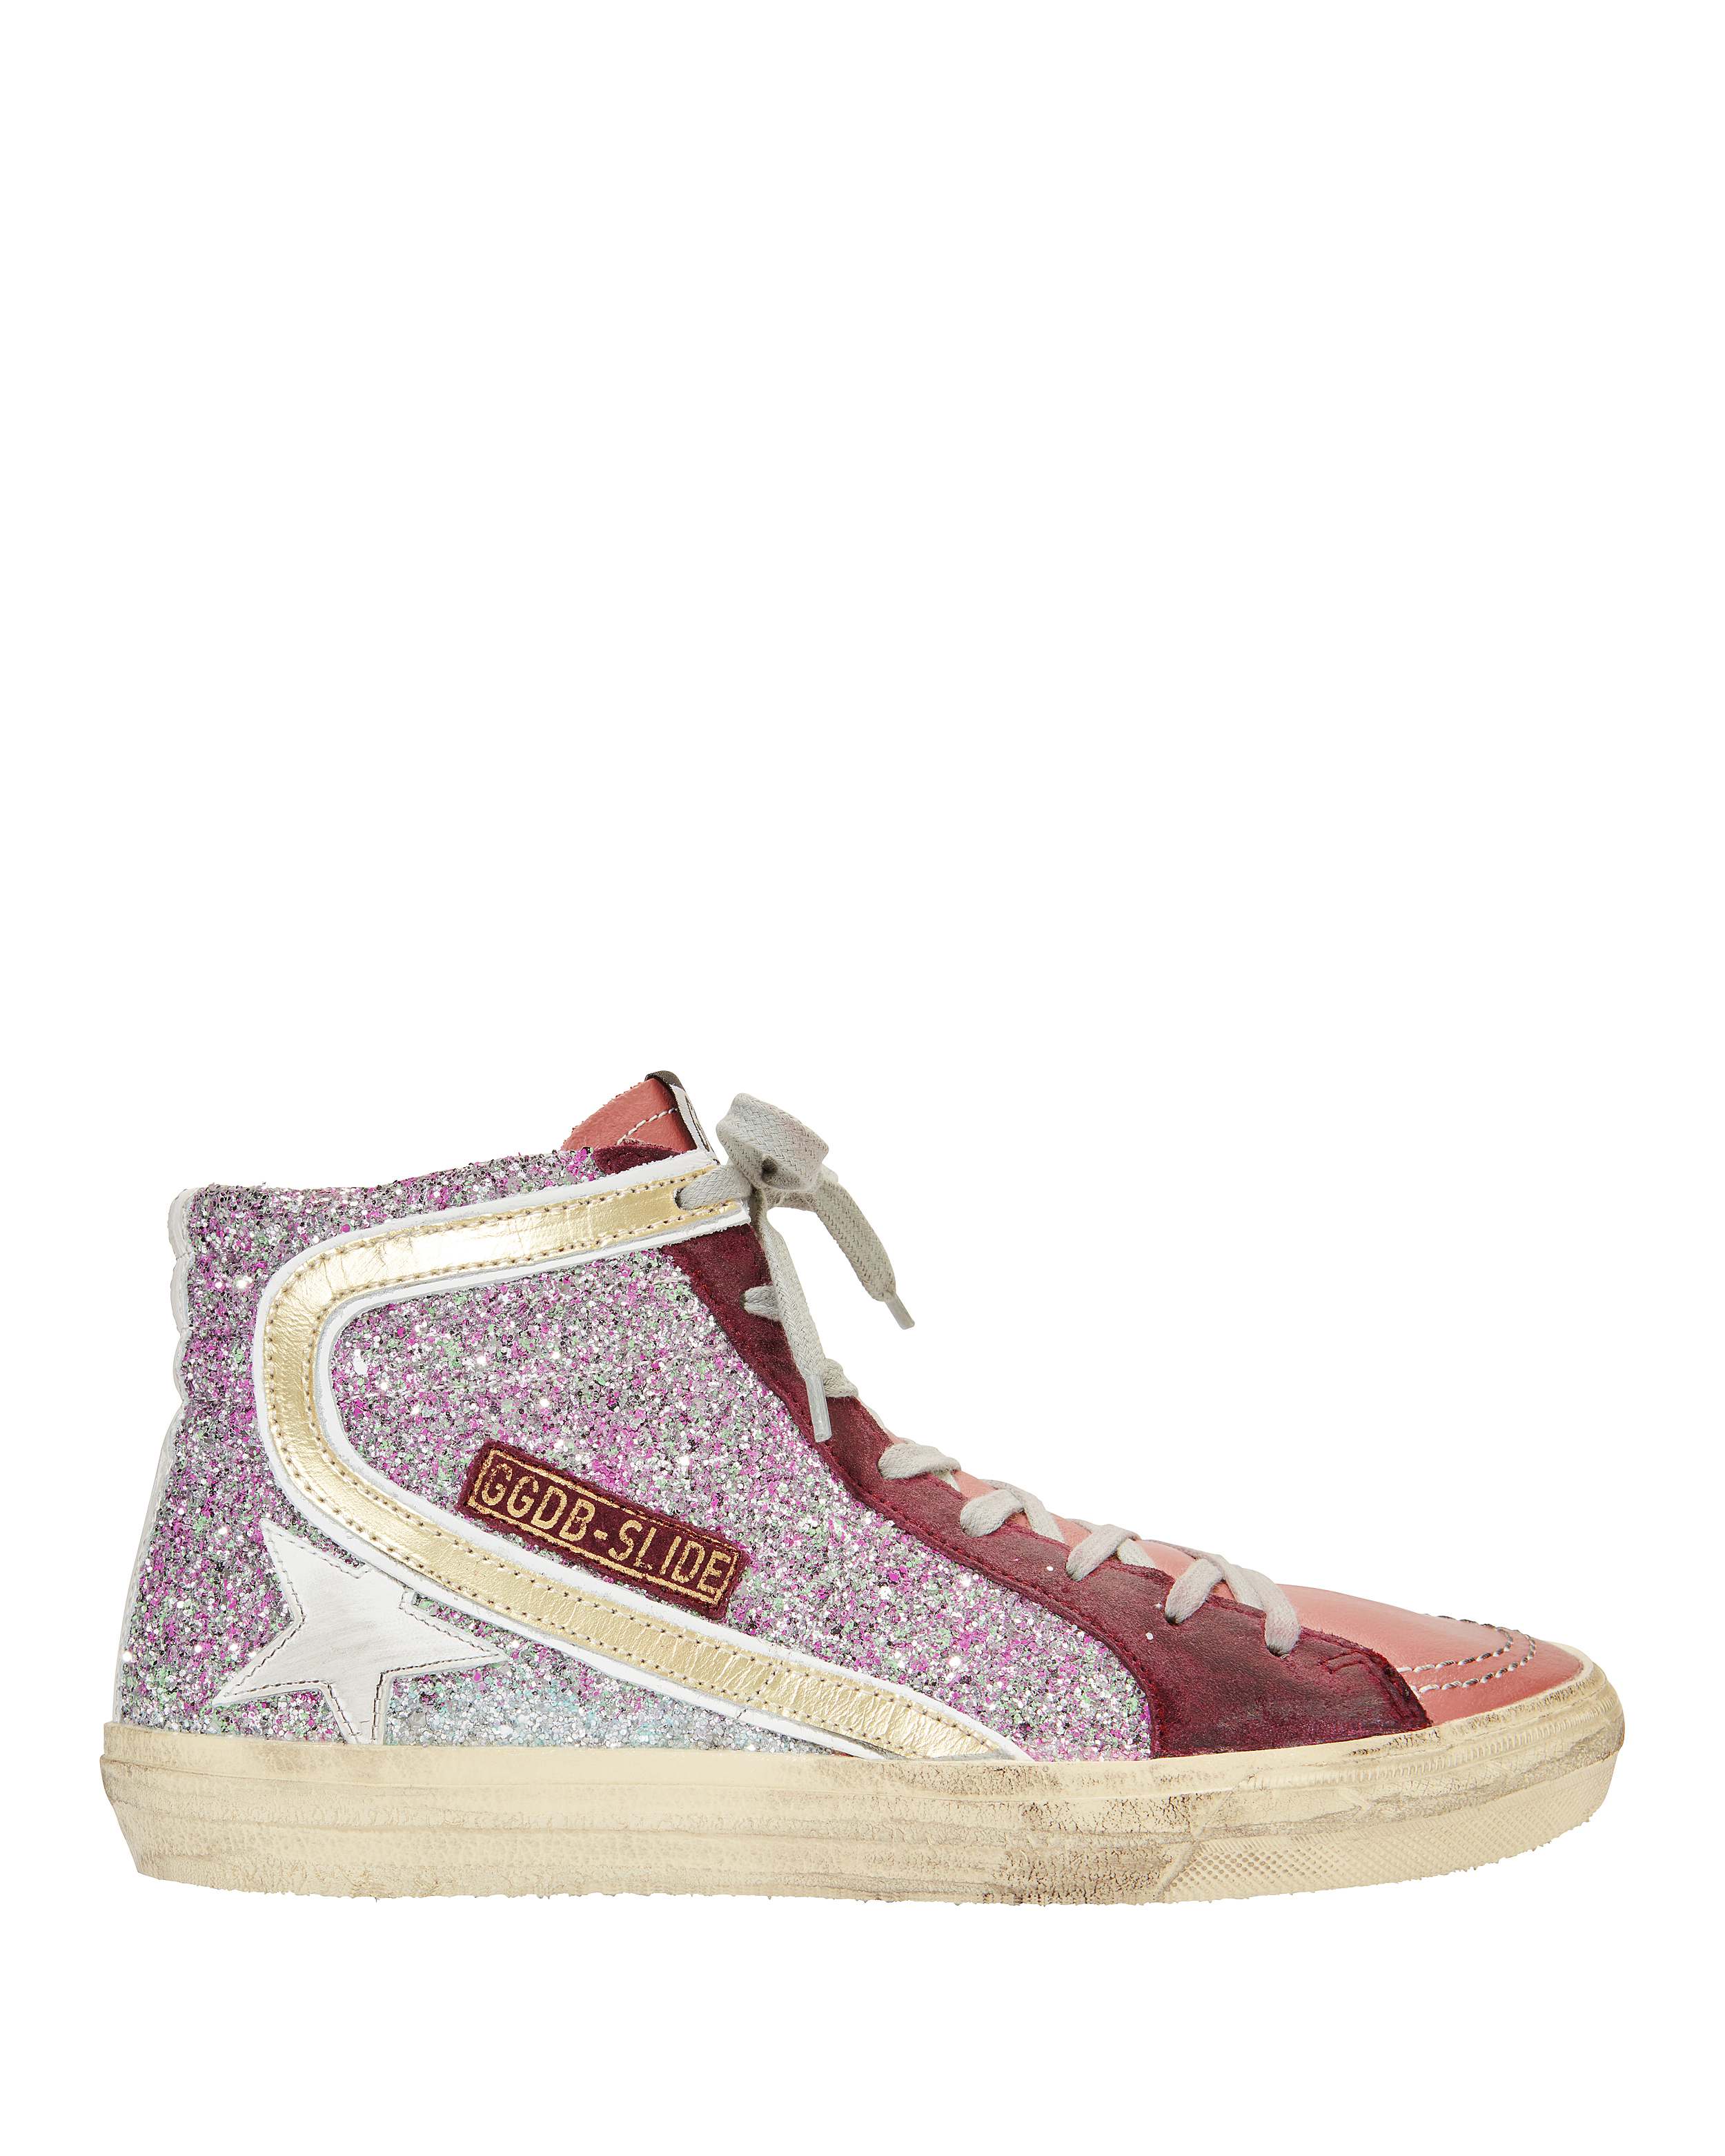 Slide Hi Top Glitter Pink Sneakers by Golden Goose